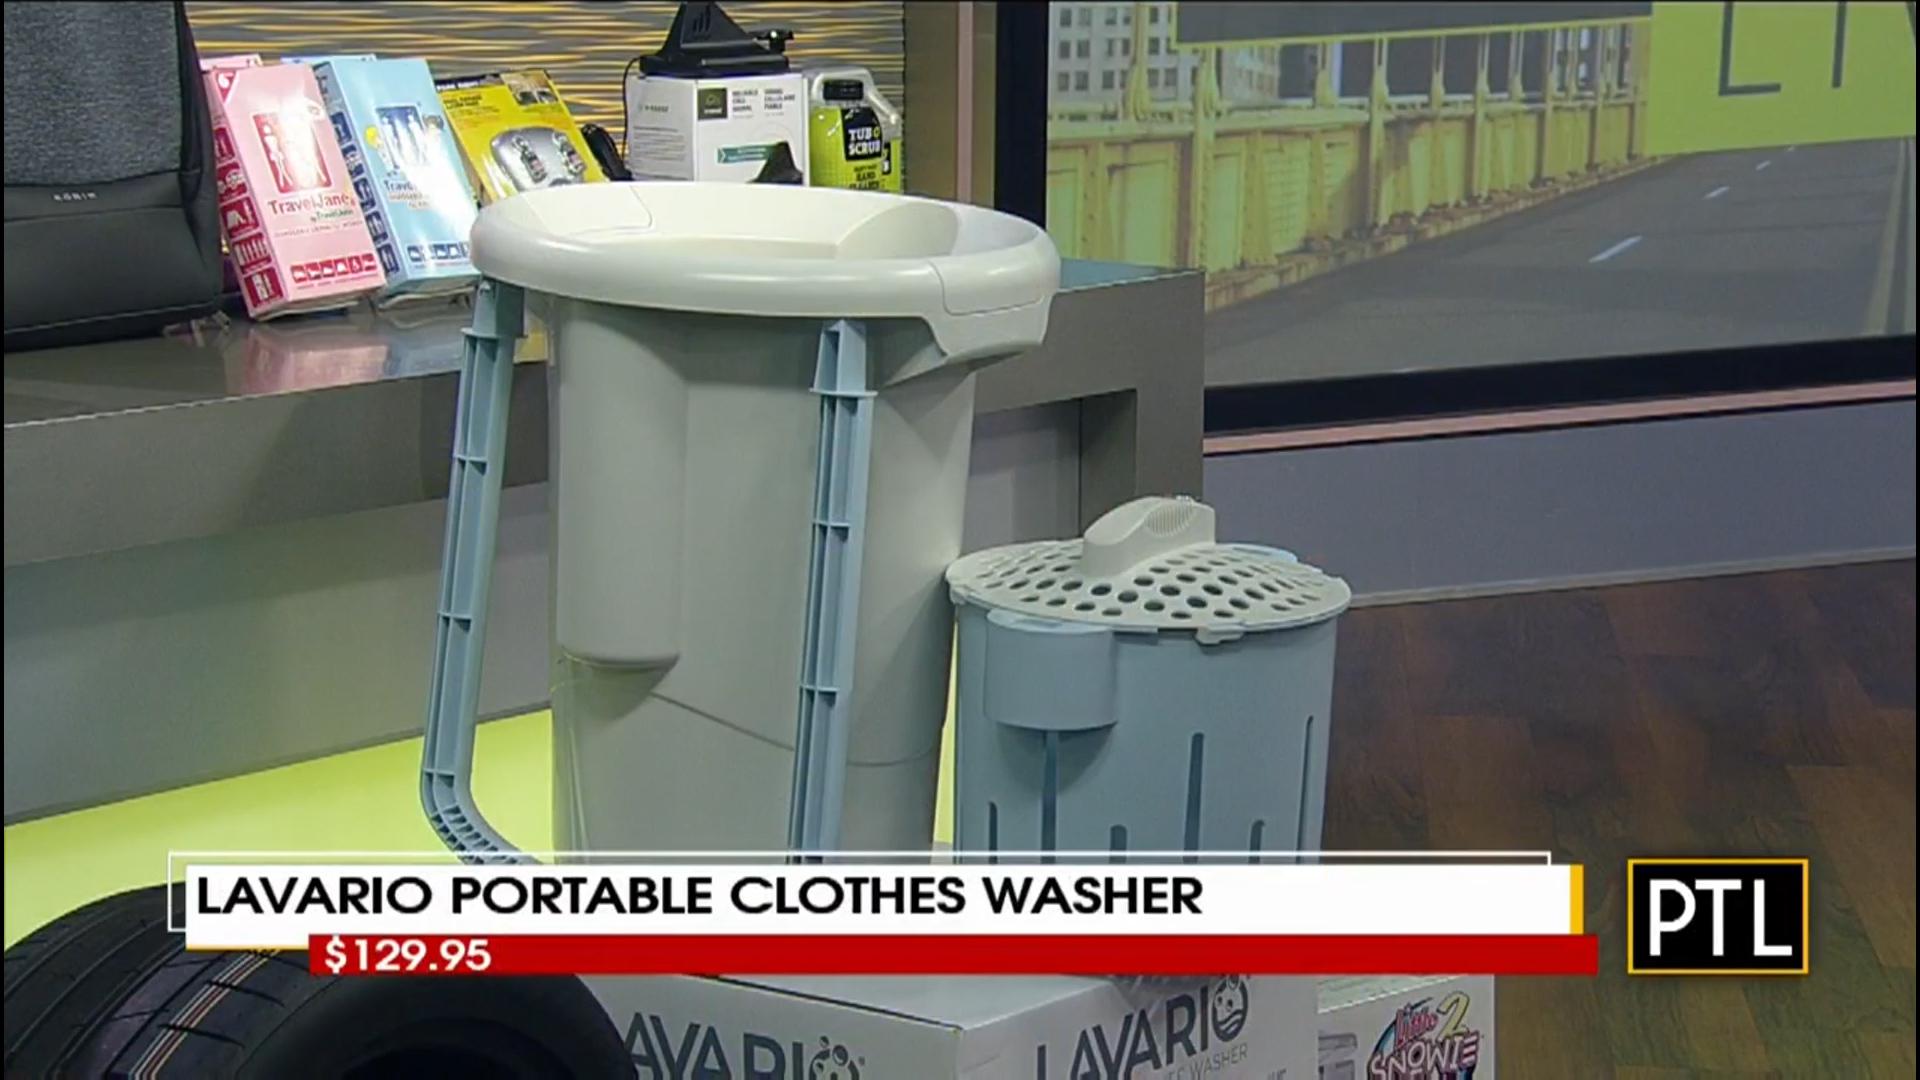 LAVARIO PORTABLE CLOTHES WASHER - $129.95Shop Now